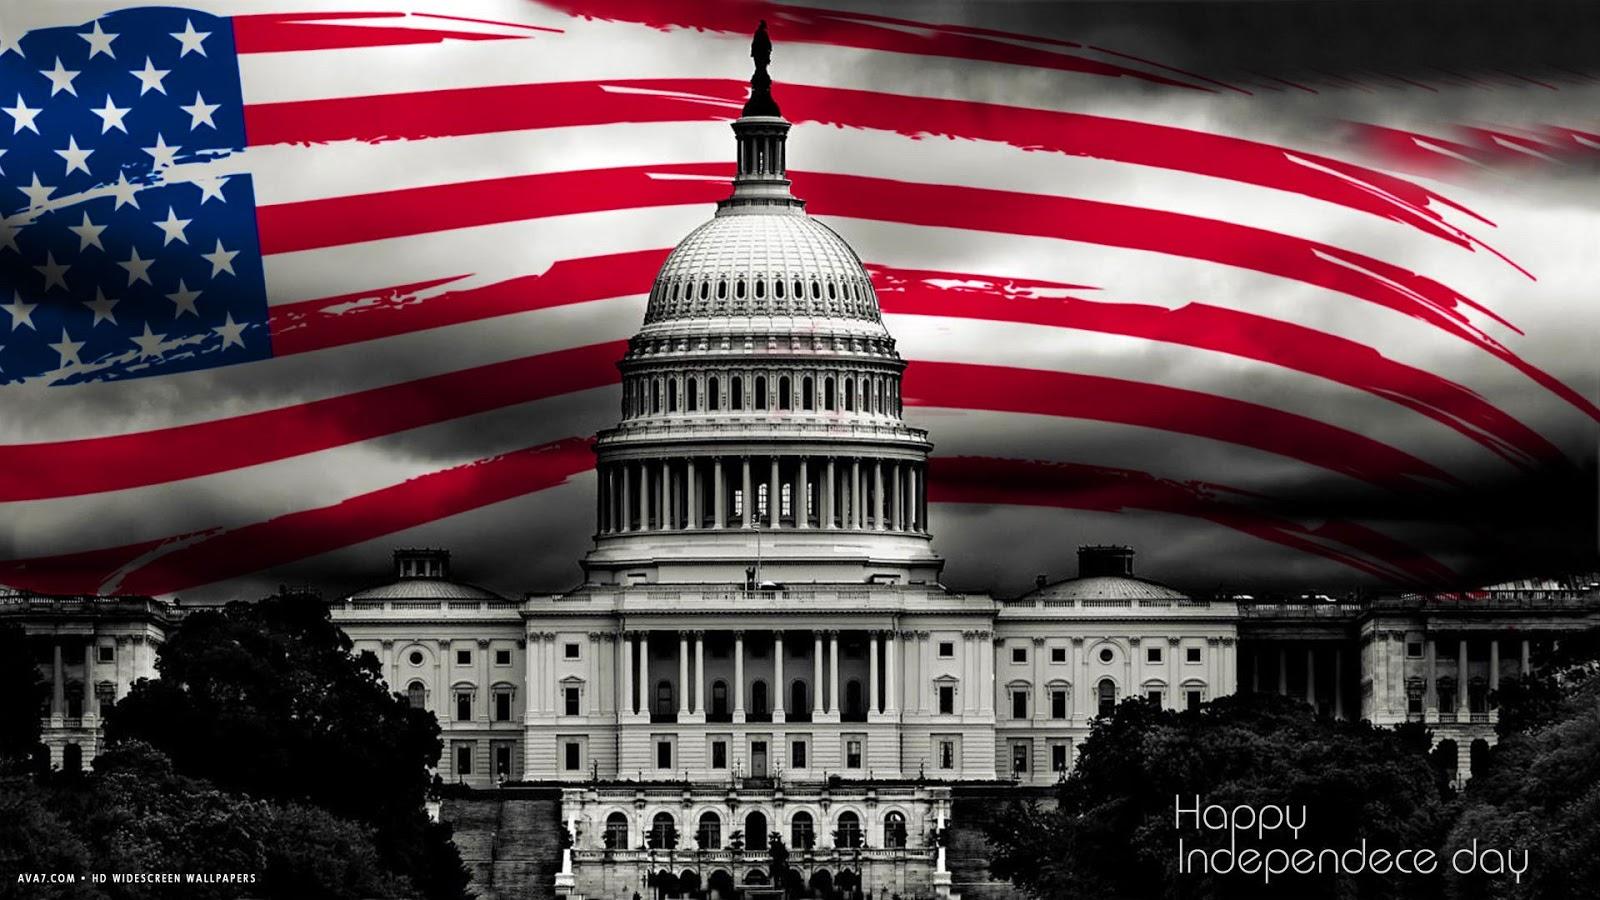 American Flag Wallpaper 1920x1080